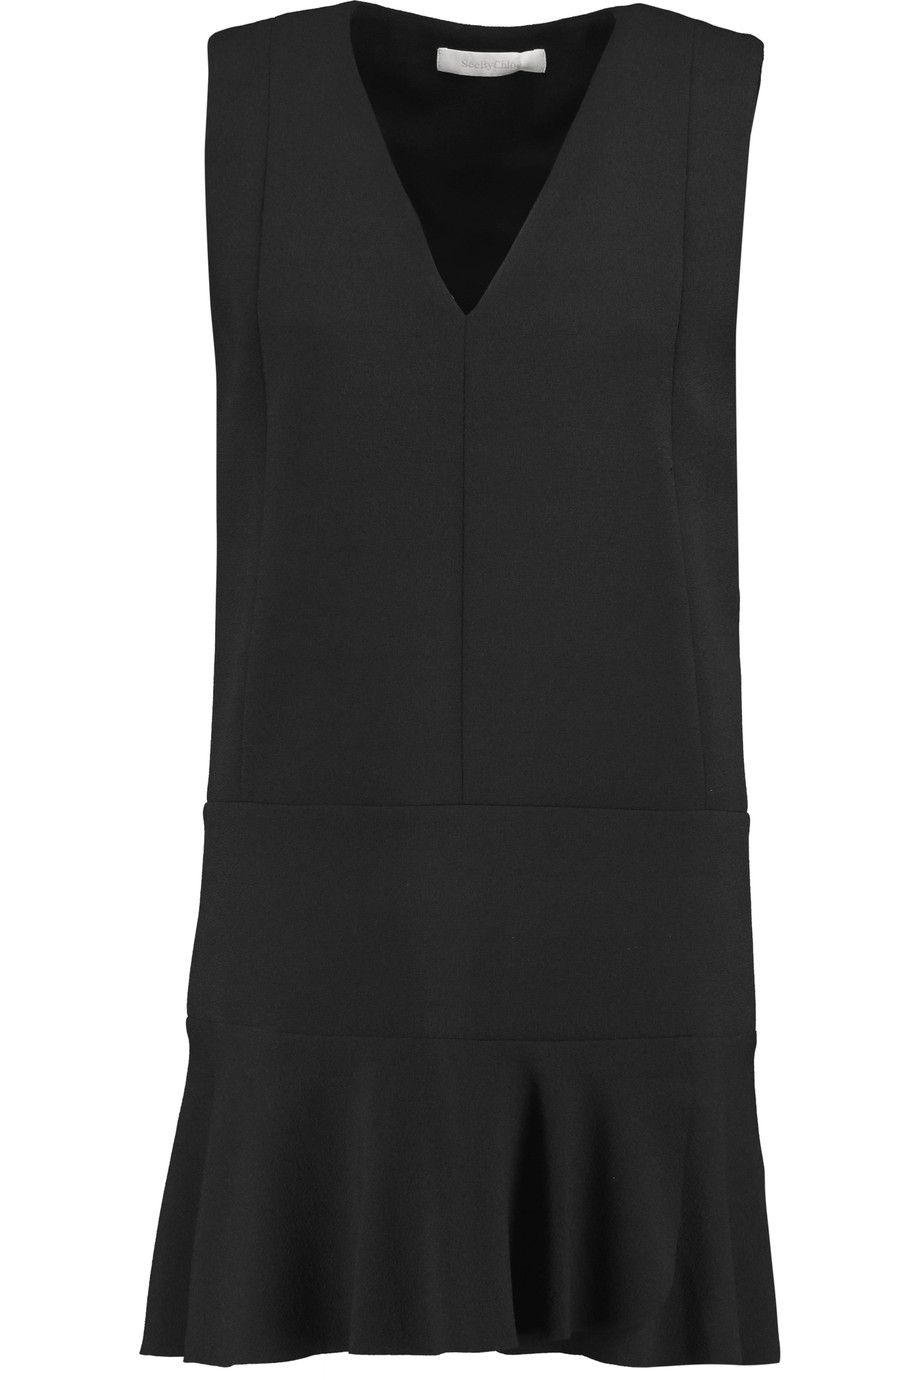 SEE BY CHLOÉ . #seebychloé #cloth #dress